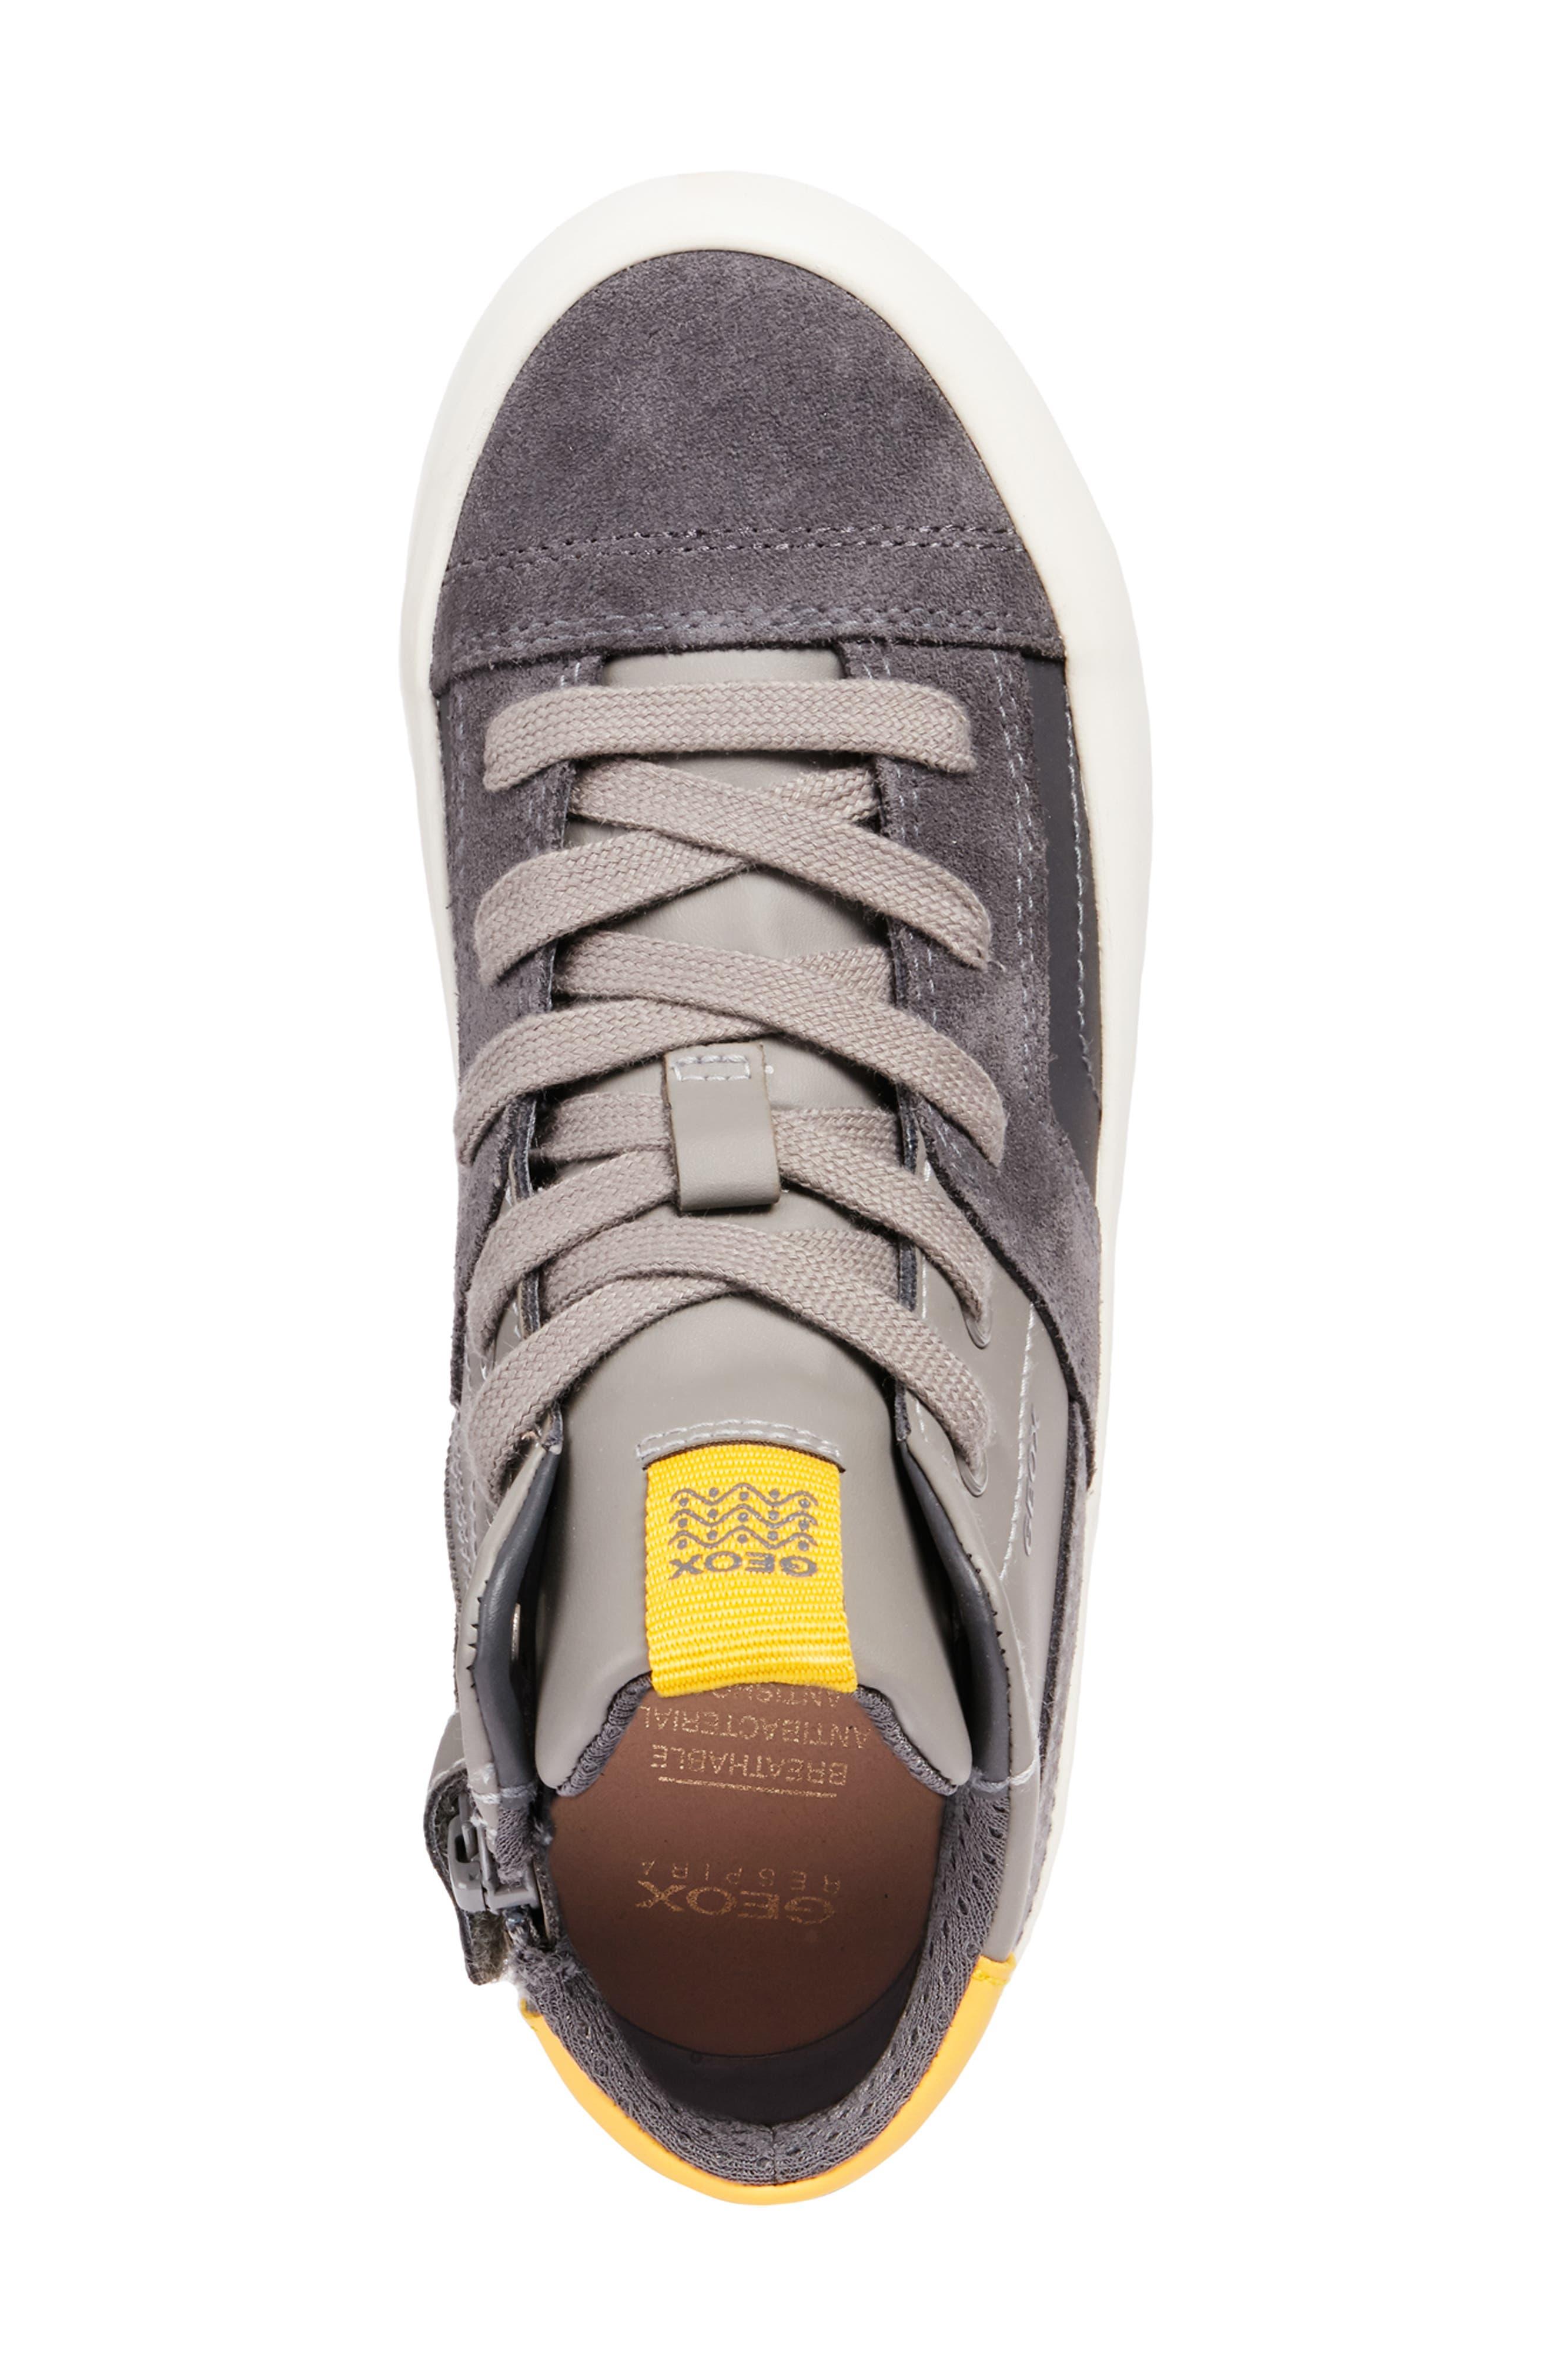 Alonisso 24 High Top Sneaker,                             Alternate thumbnail 4, color,                             DARK GREY/YELLOW